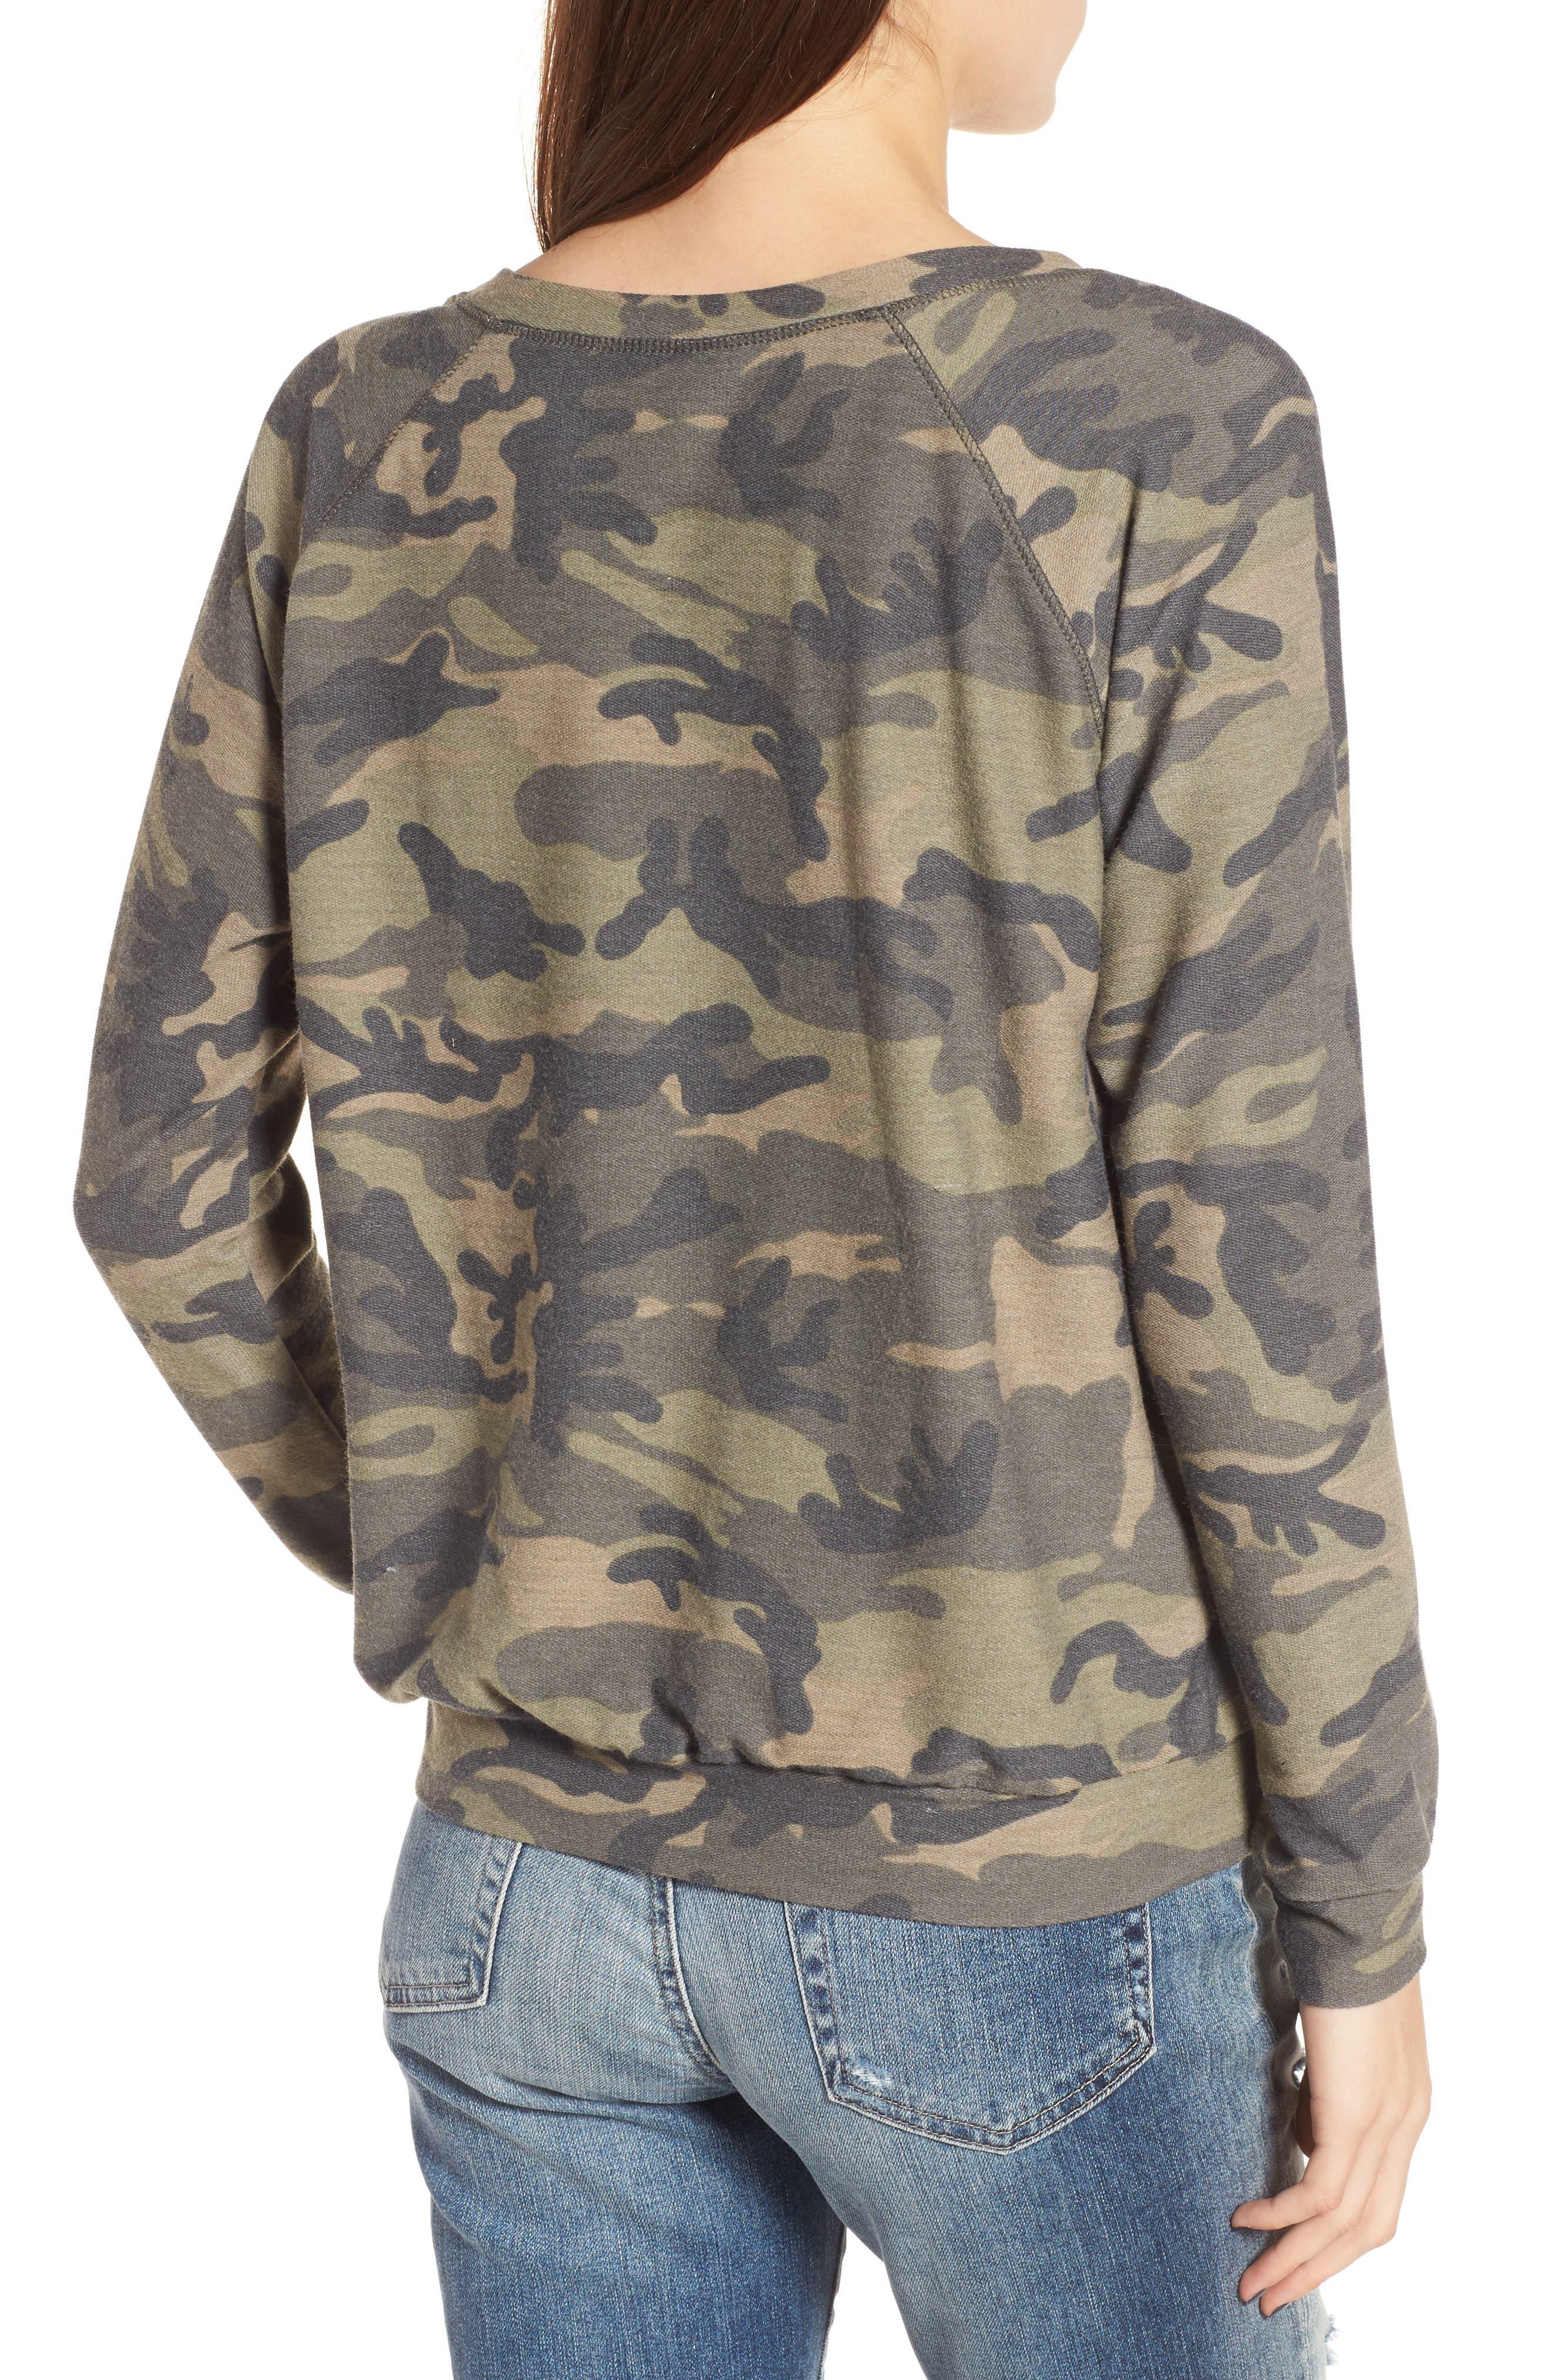 Bah Humpug Sweatshirt,                             Alternate thumbnail 2, color,                             300